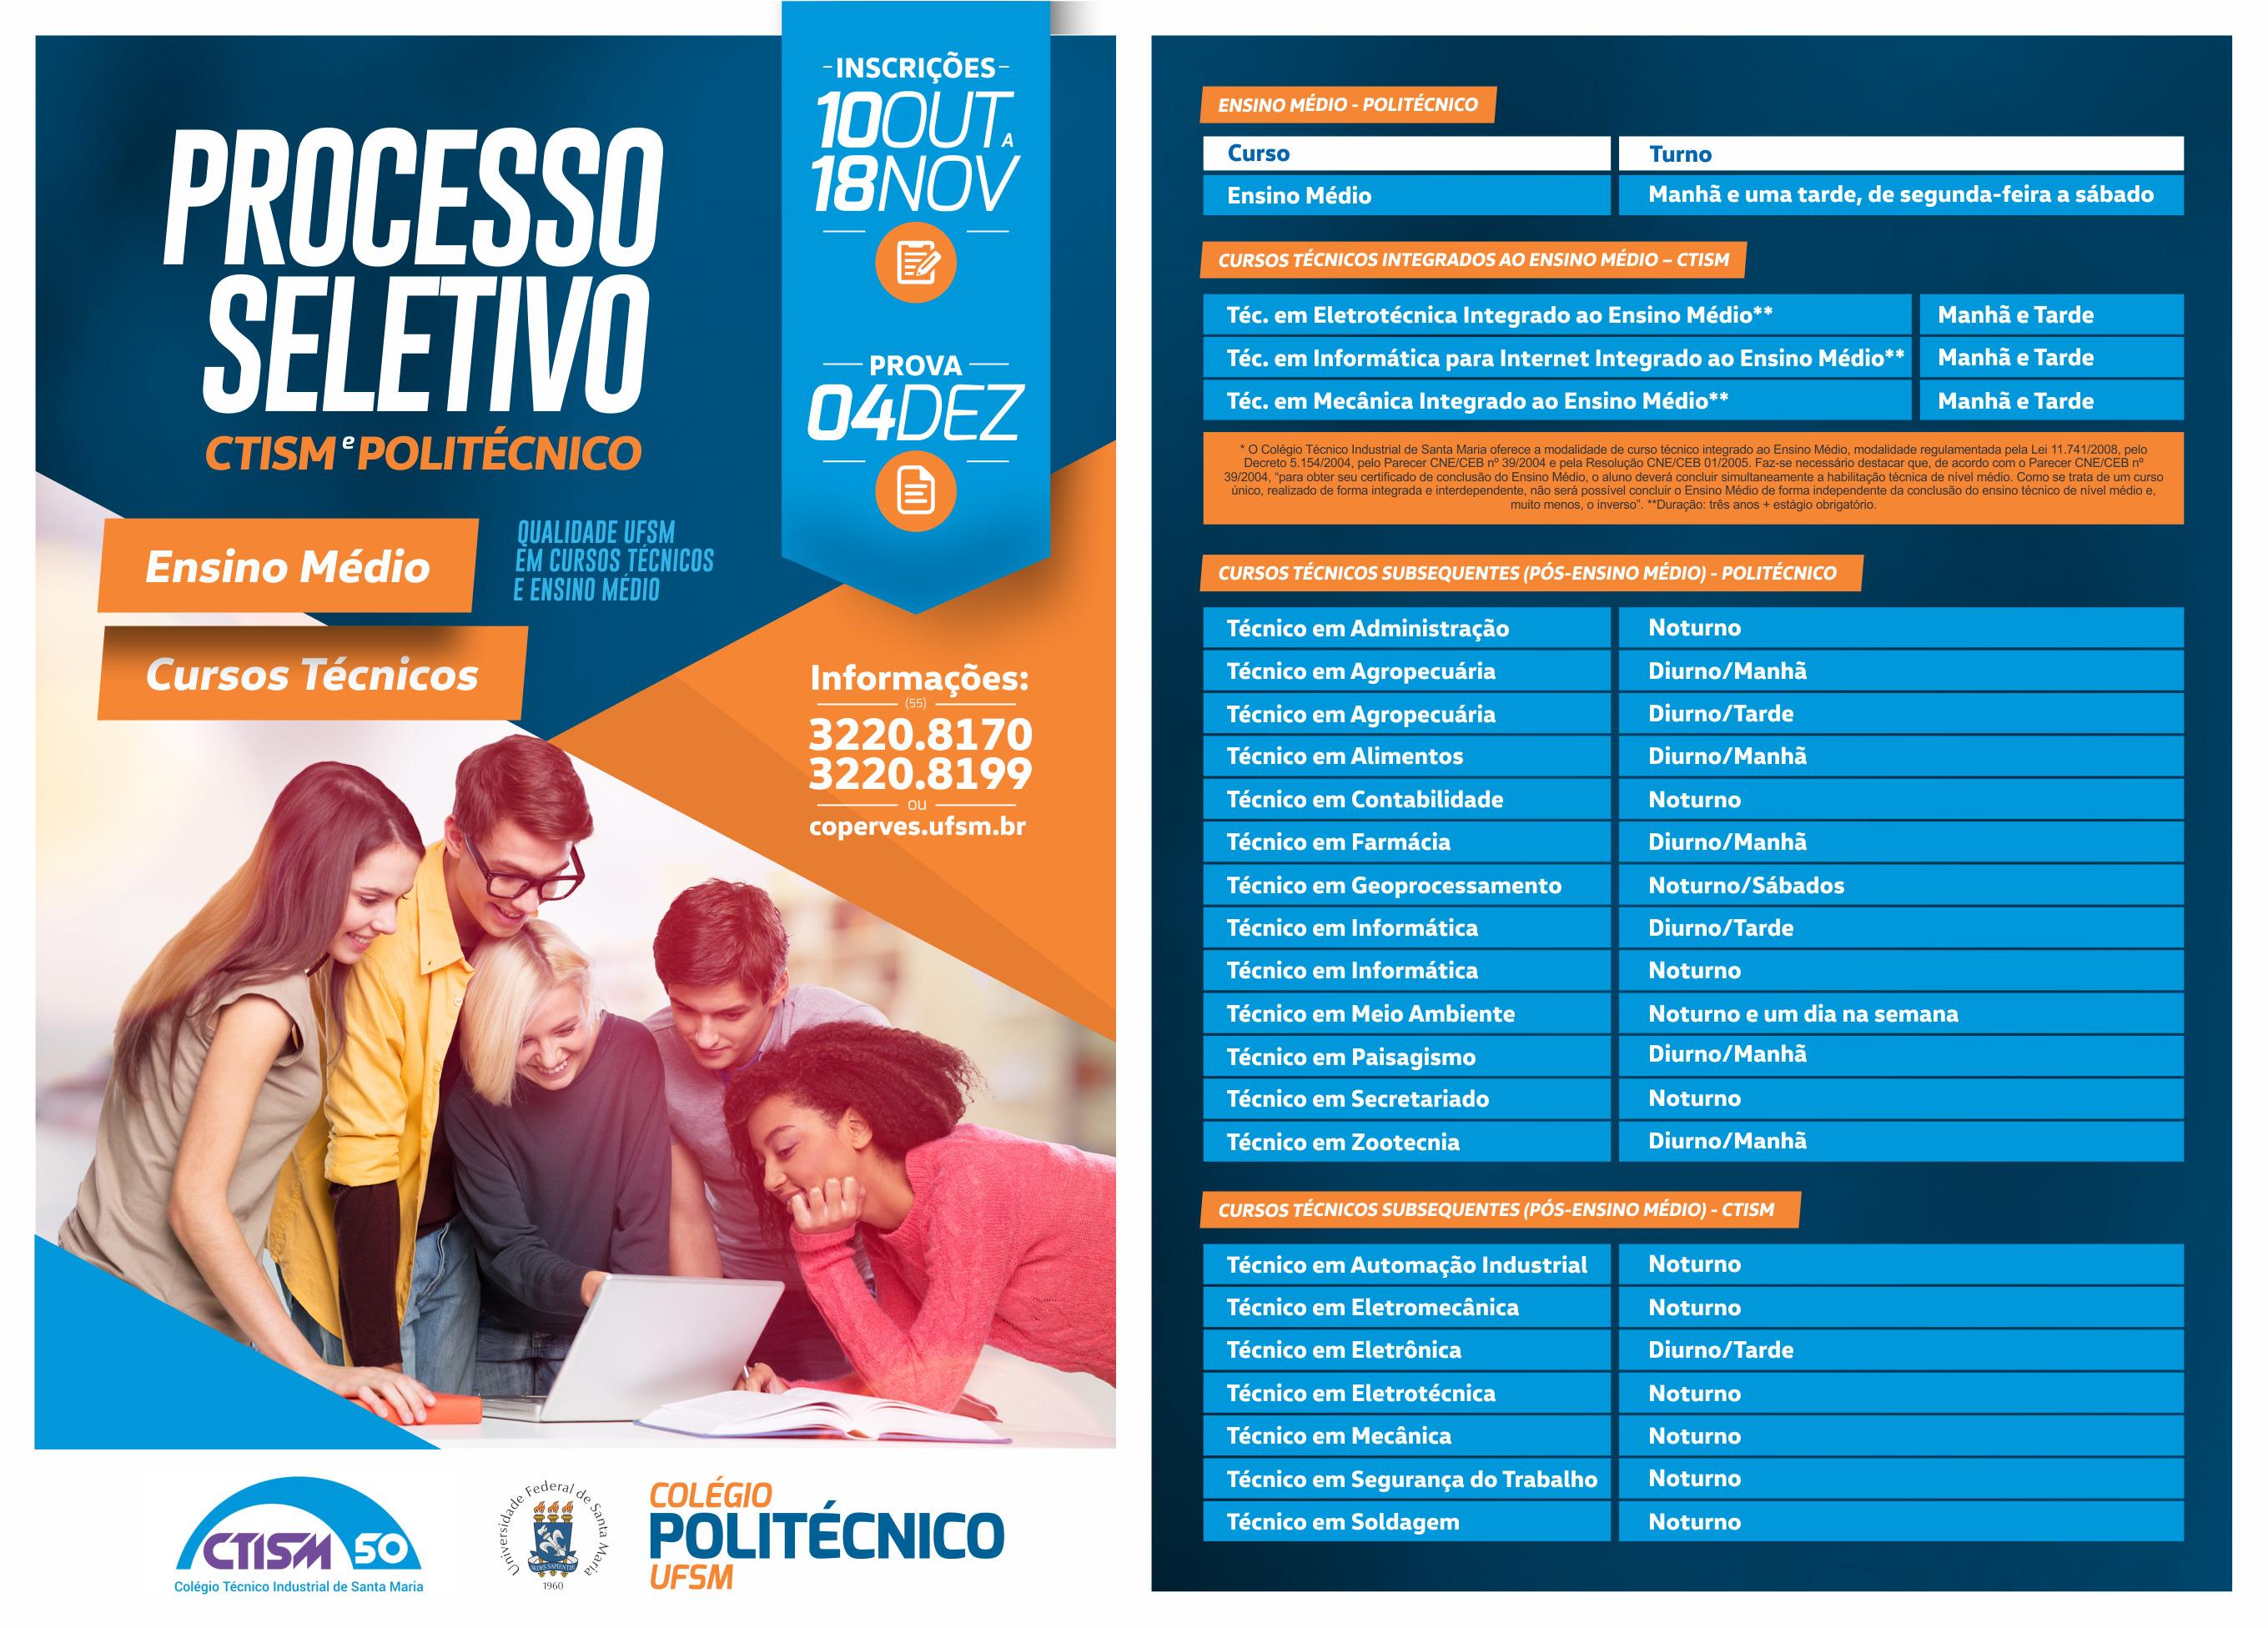 POLITECNICO ProcessoSeletivo 2